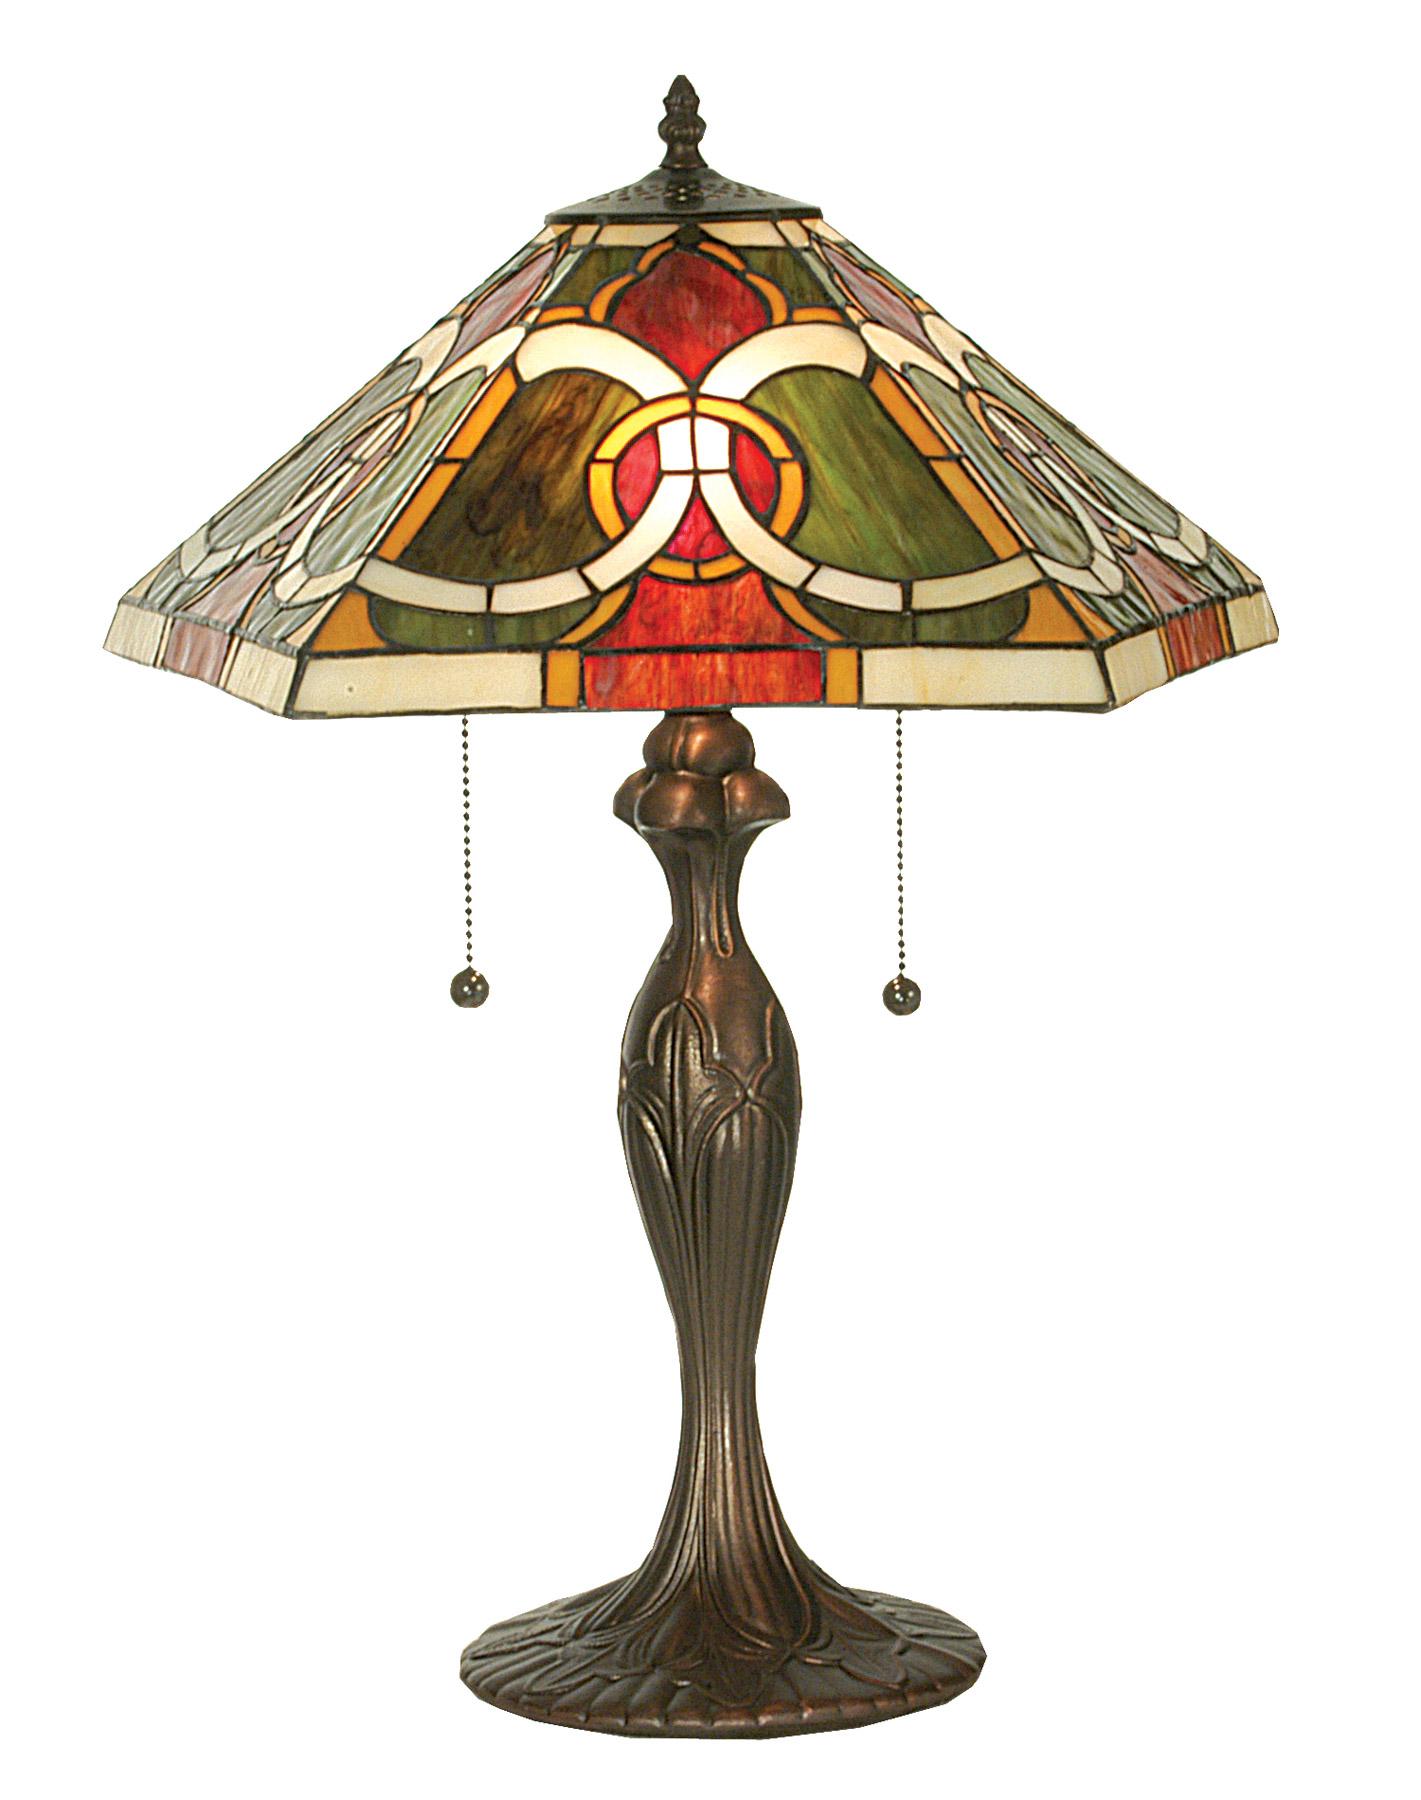 meyda 81457 tiffany moroccan table lamp. Black Bedroom Furniture Sets. Home Design Ideas